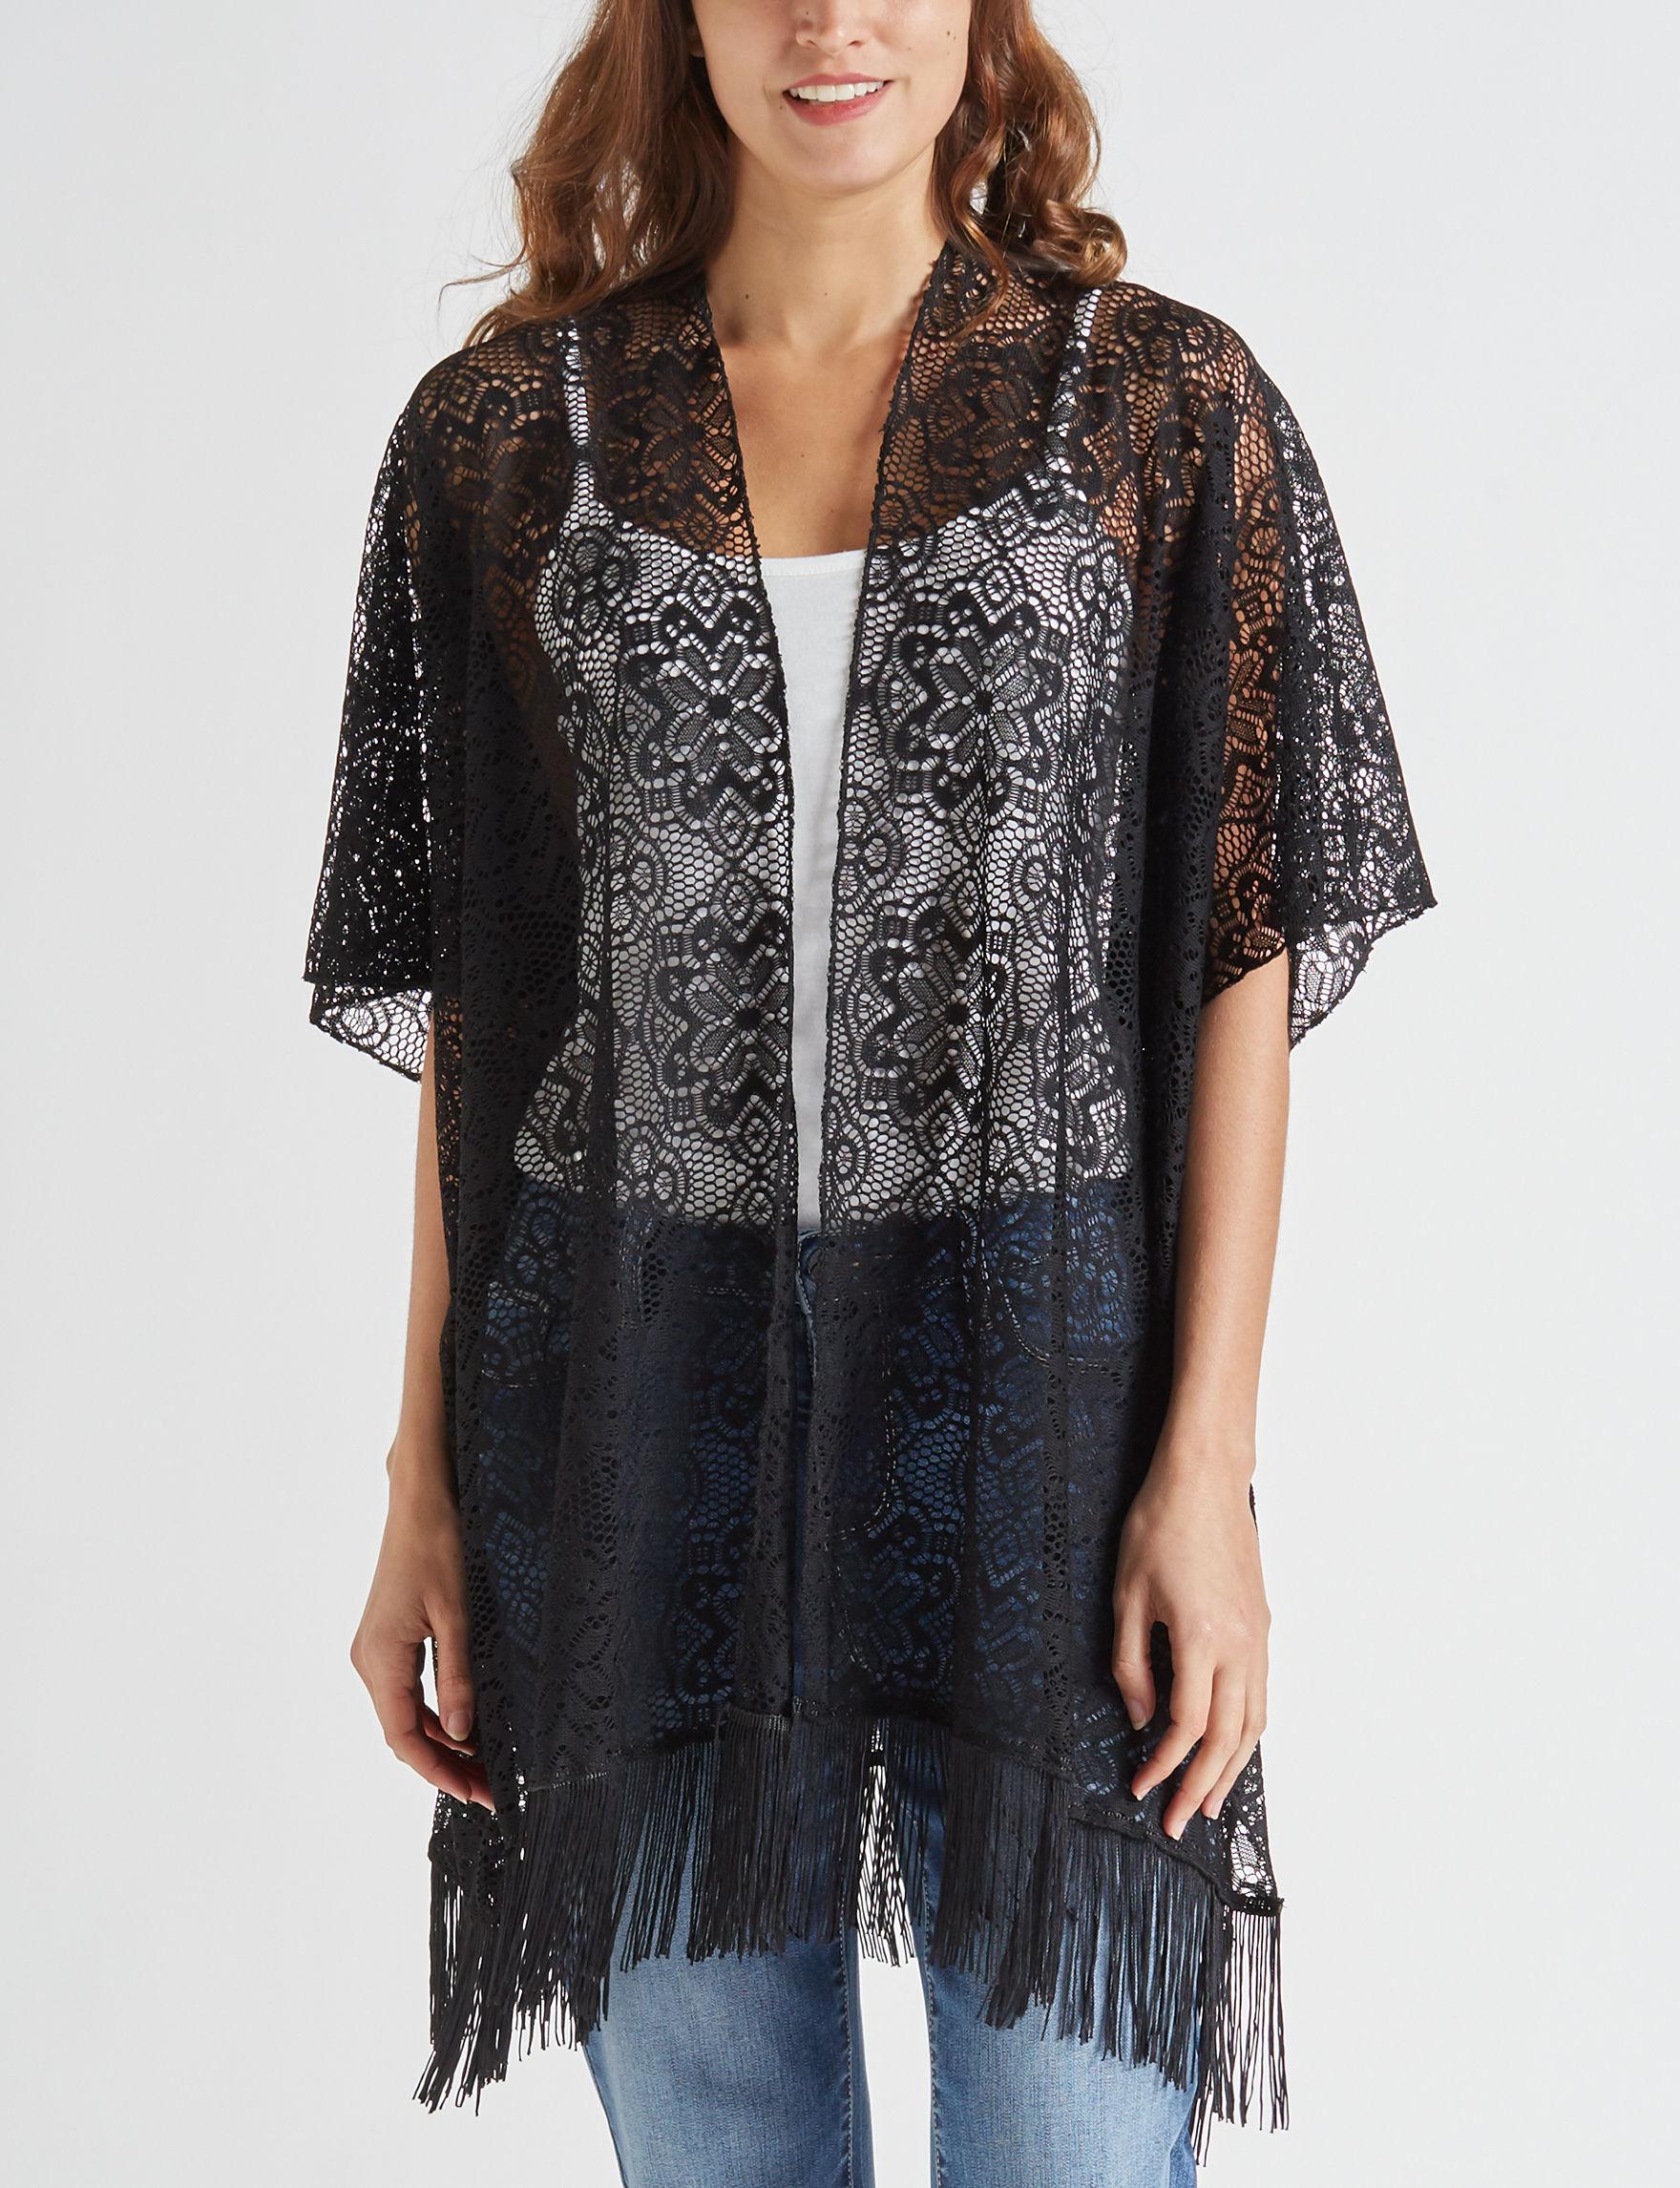 Basha Black Kimonos & Toppers